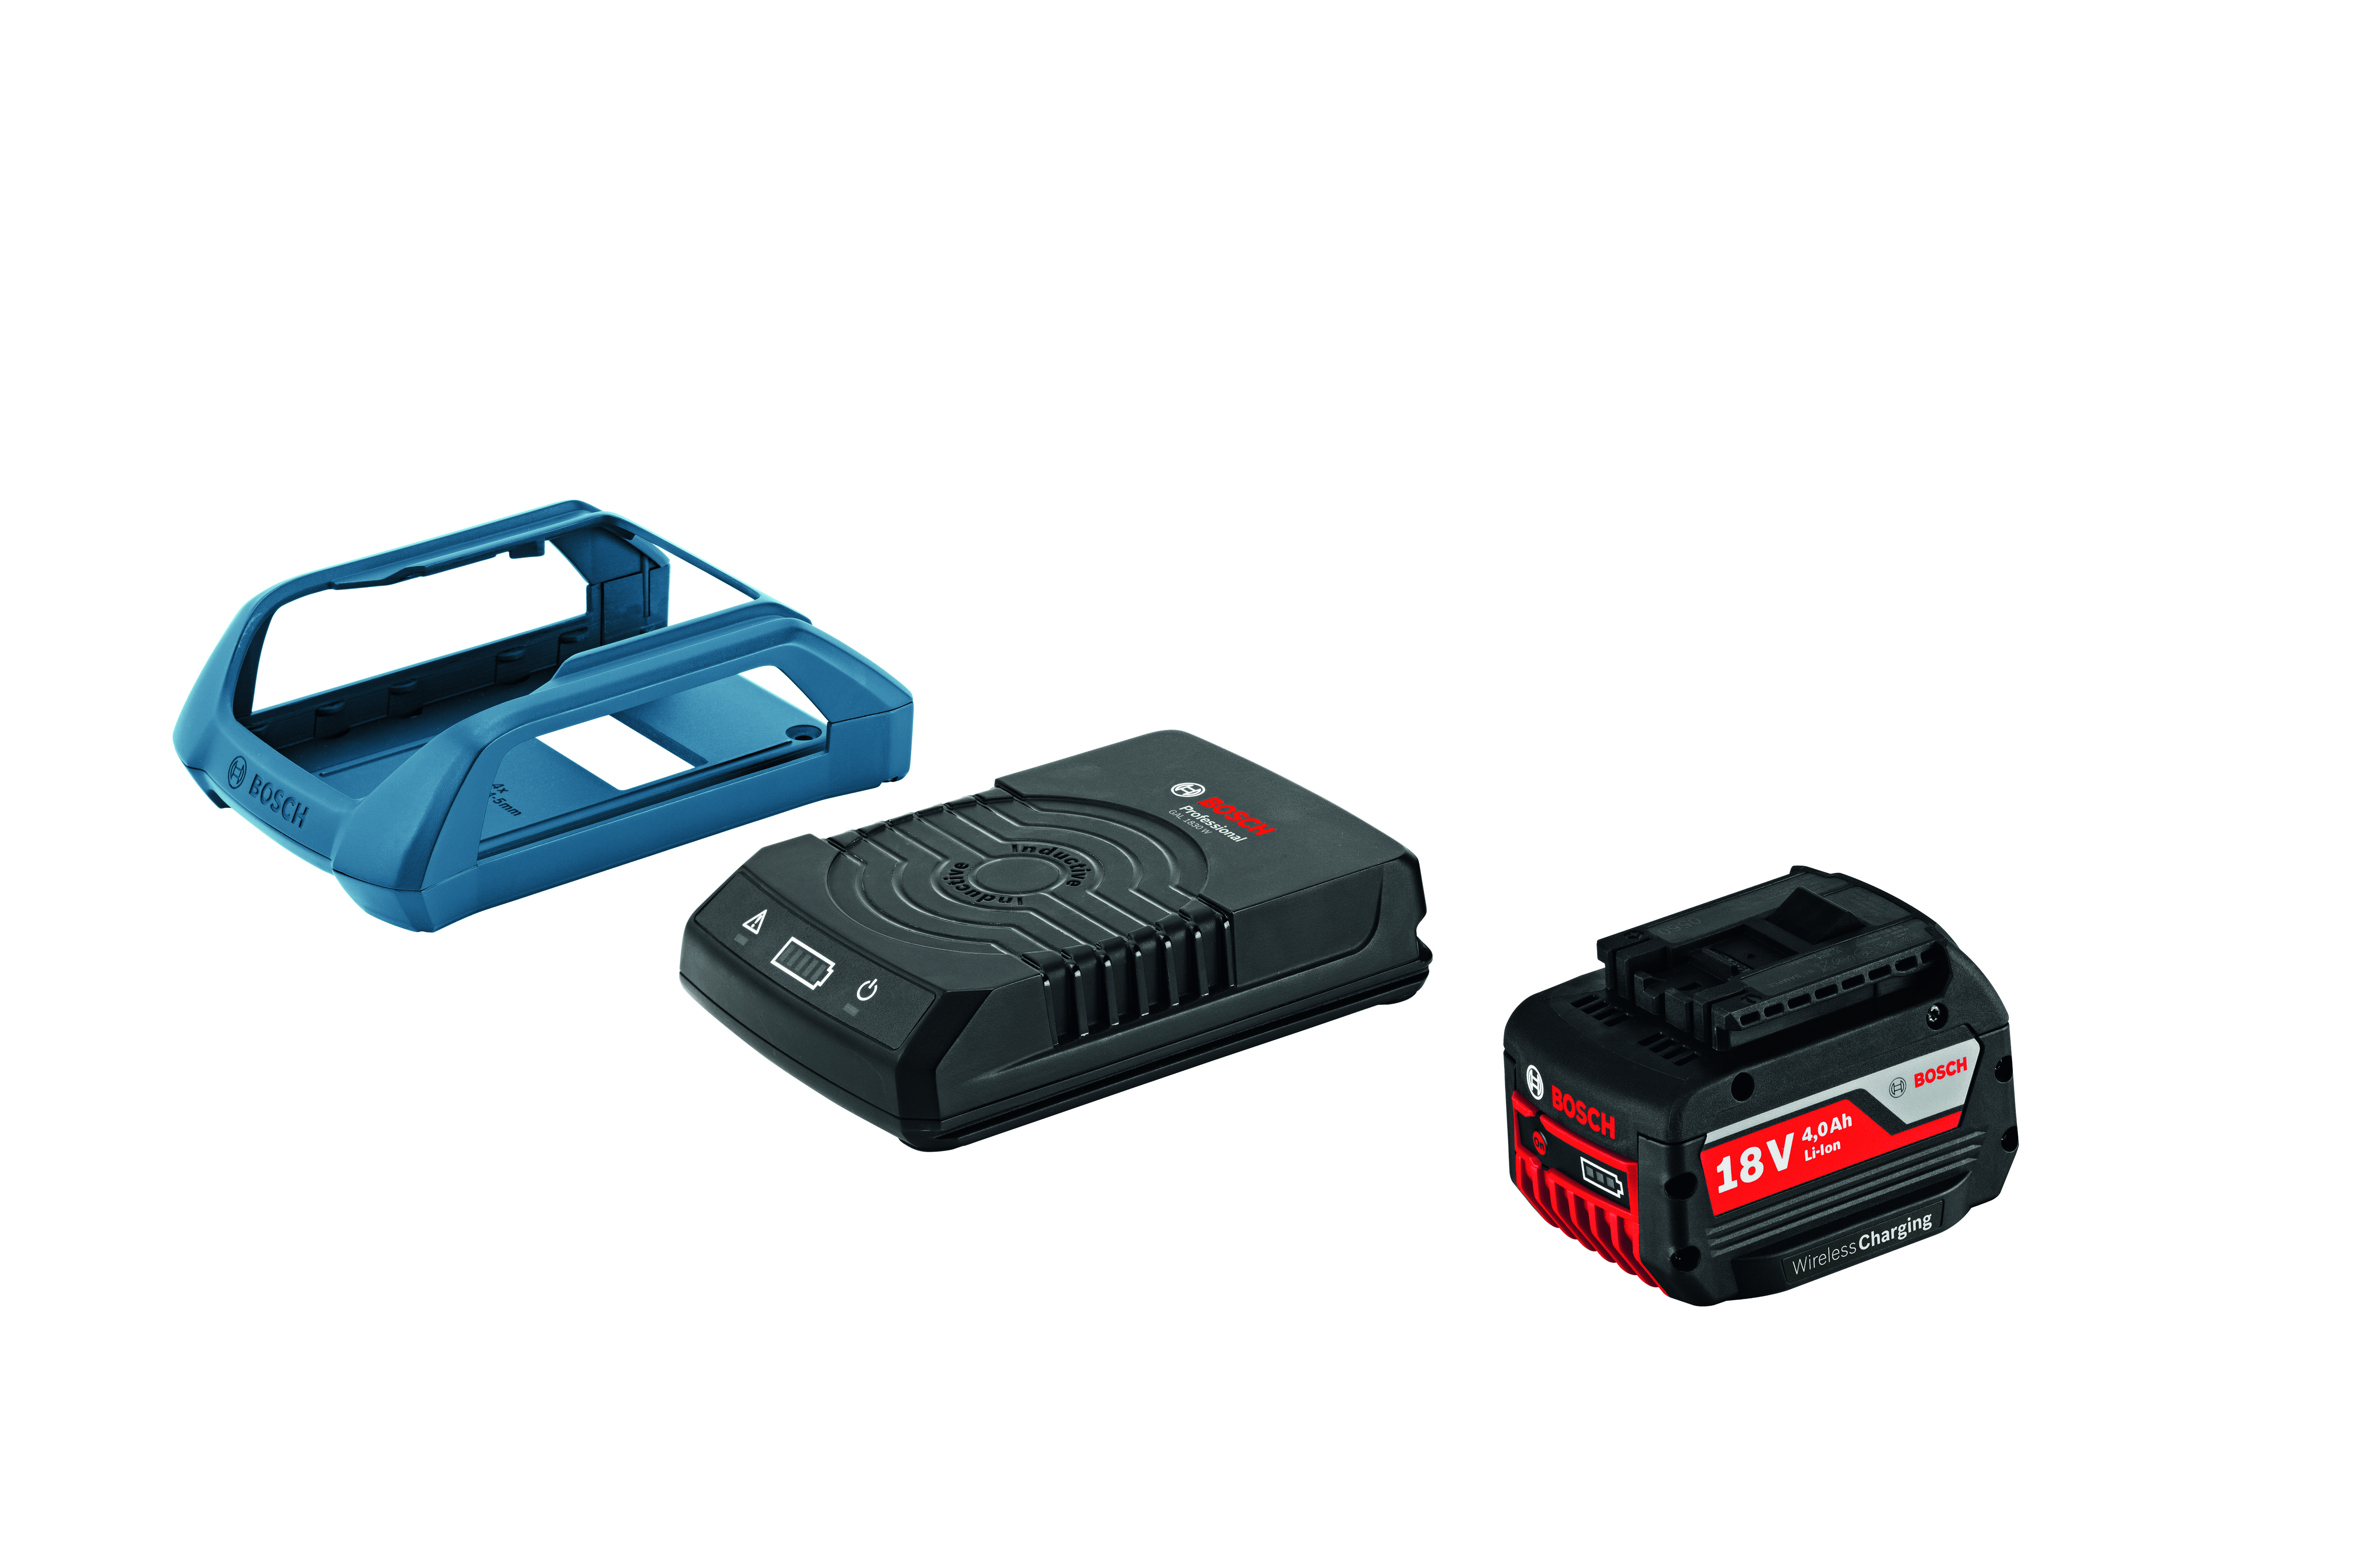 Image of   Startsæt GBA 18 V 4,0 Ah W + GAL 1830 W Wireless Charging Startsæt Wireless Charging akku GBA 18 V 4,0 Ah W + lader GAL 1830 W Professional